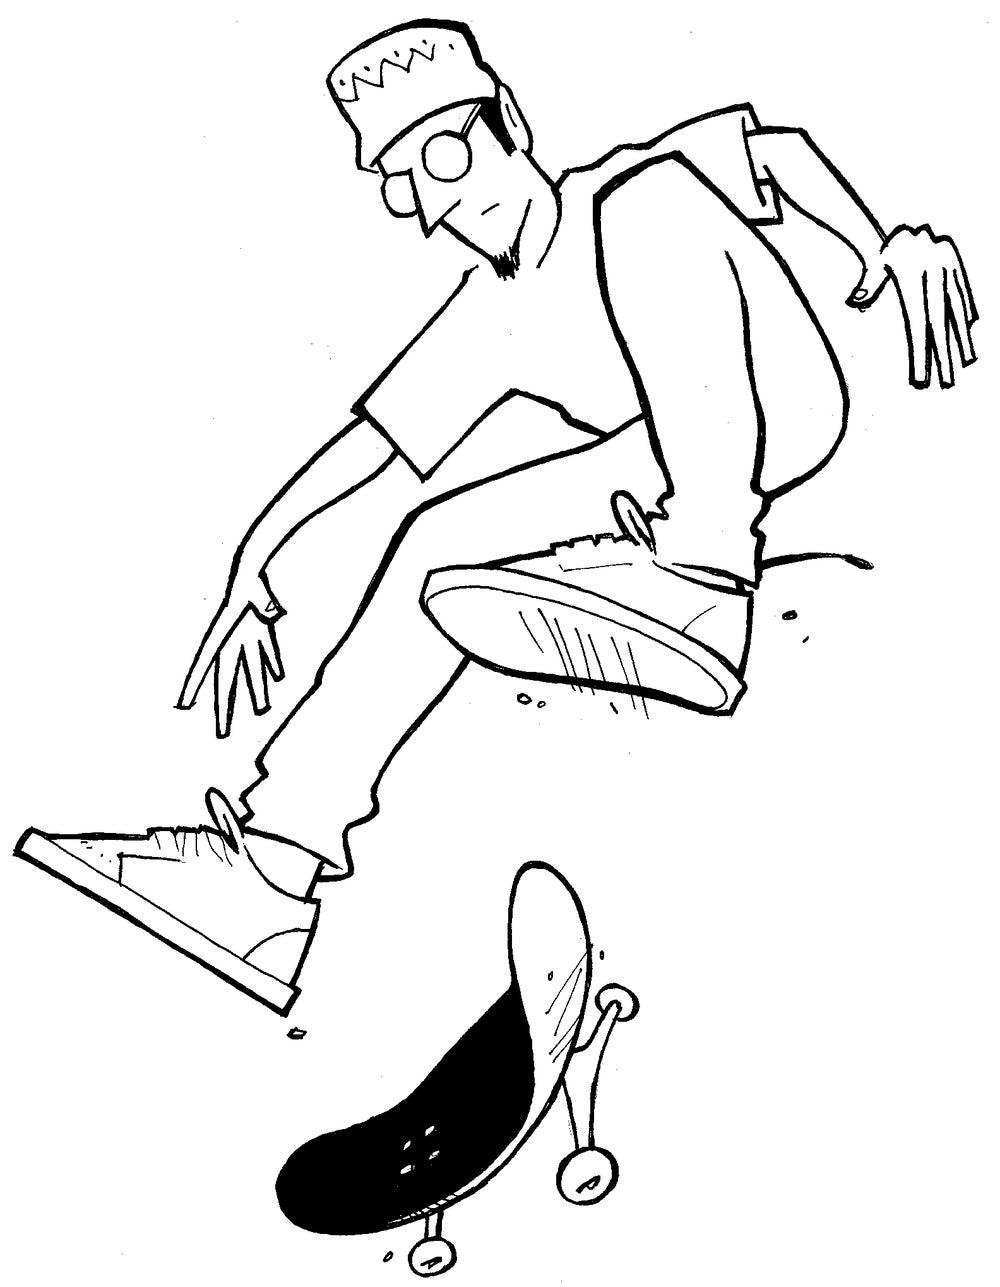 Image of LETTUS BEE / Mikemo Capaldi Original Ink Drawing